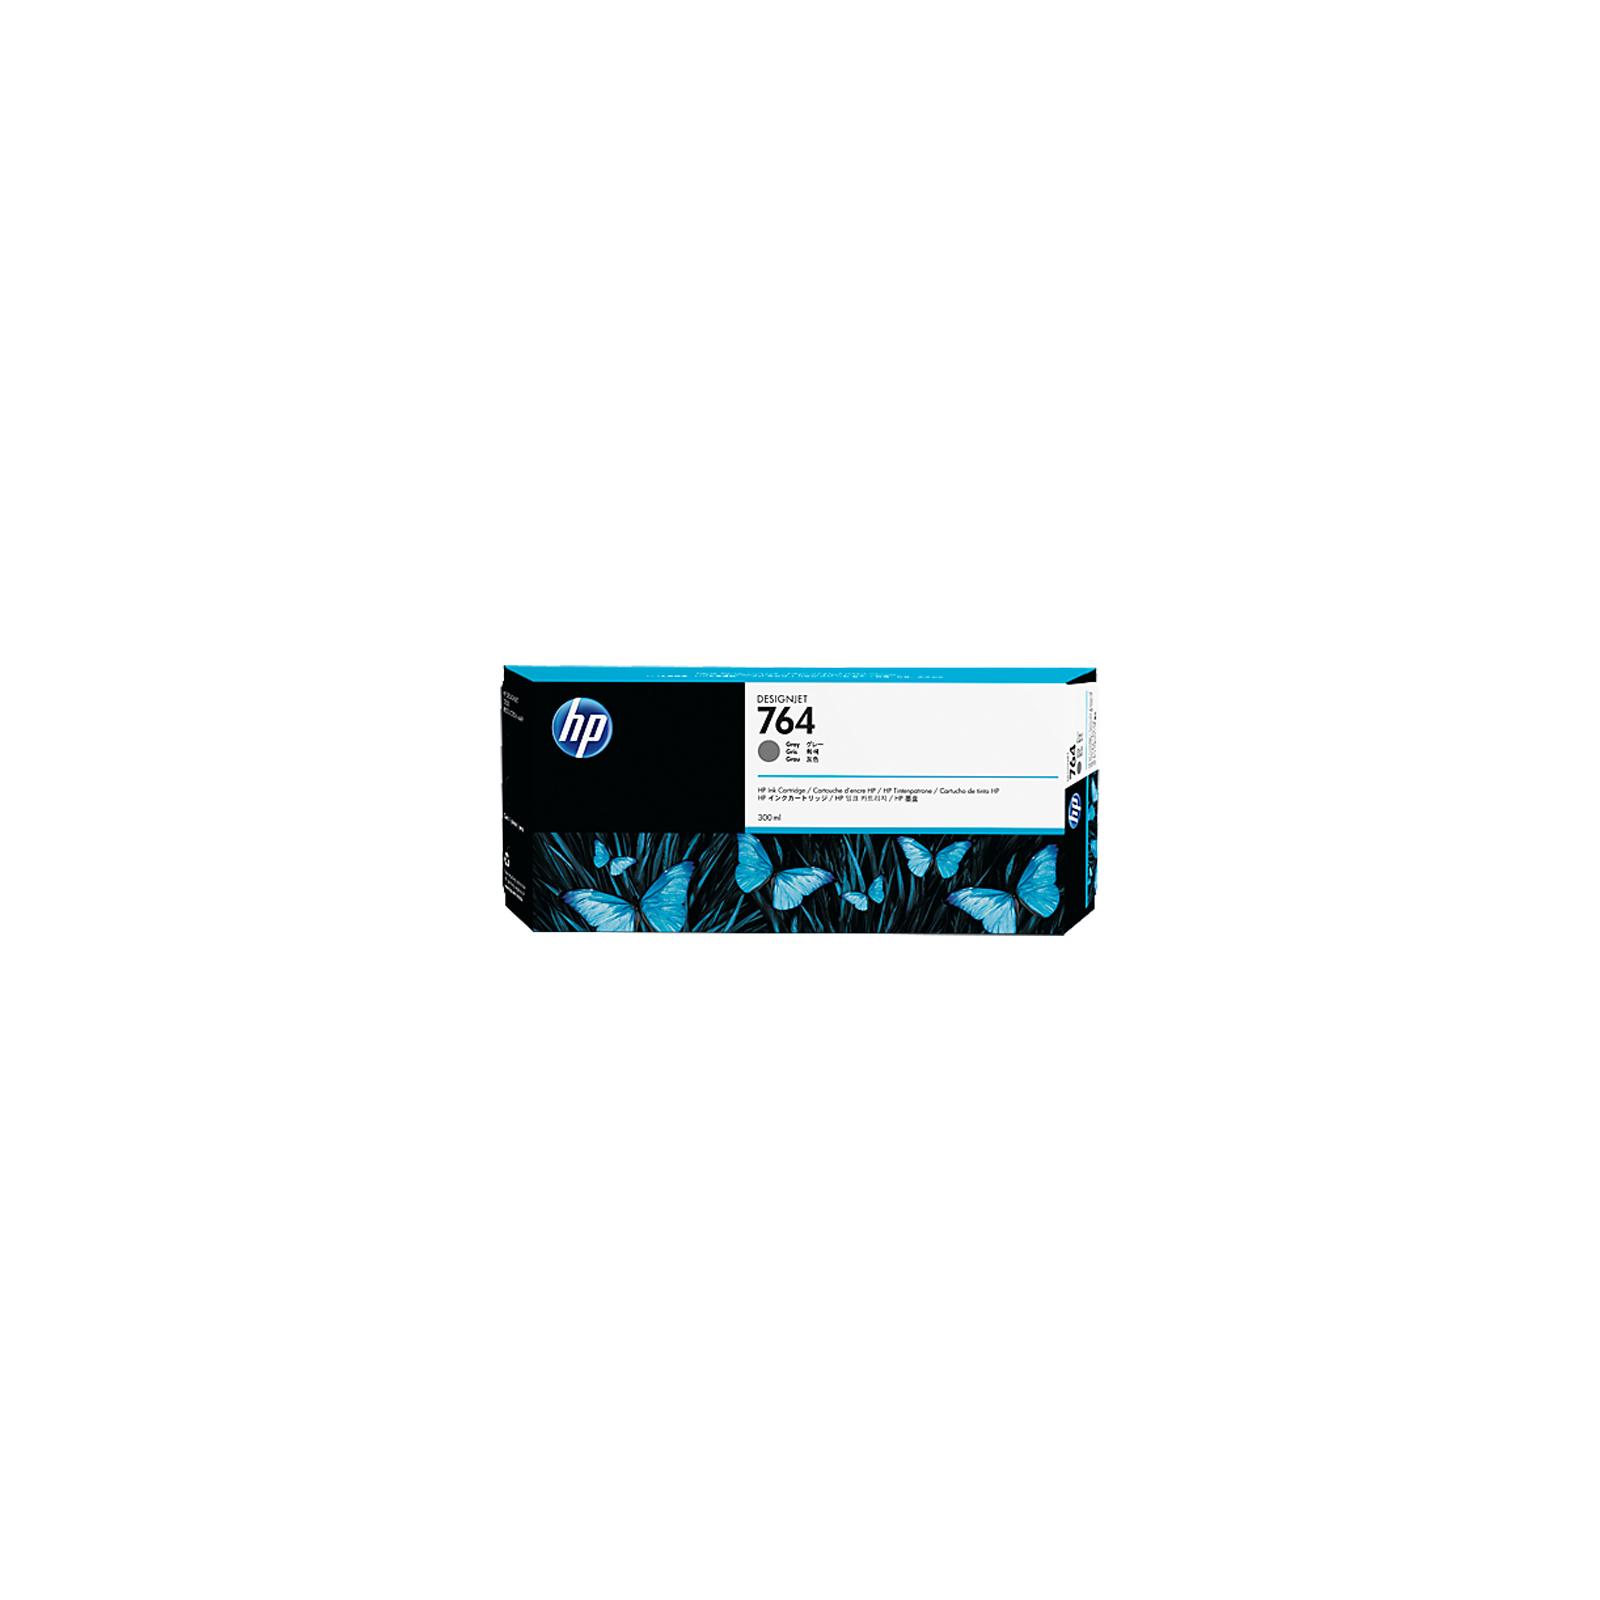 Картридж HP DJ No.764 Gray DesignJet Ink Cartridge (C1Q18A)